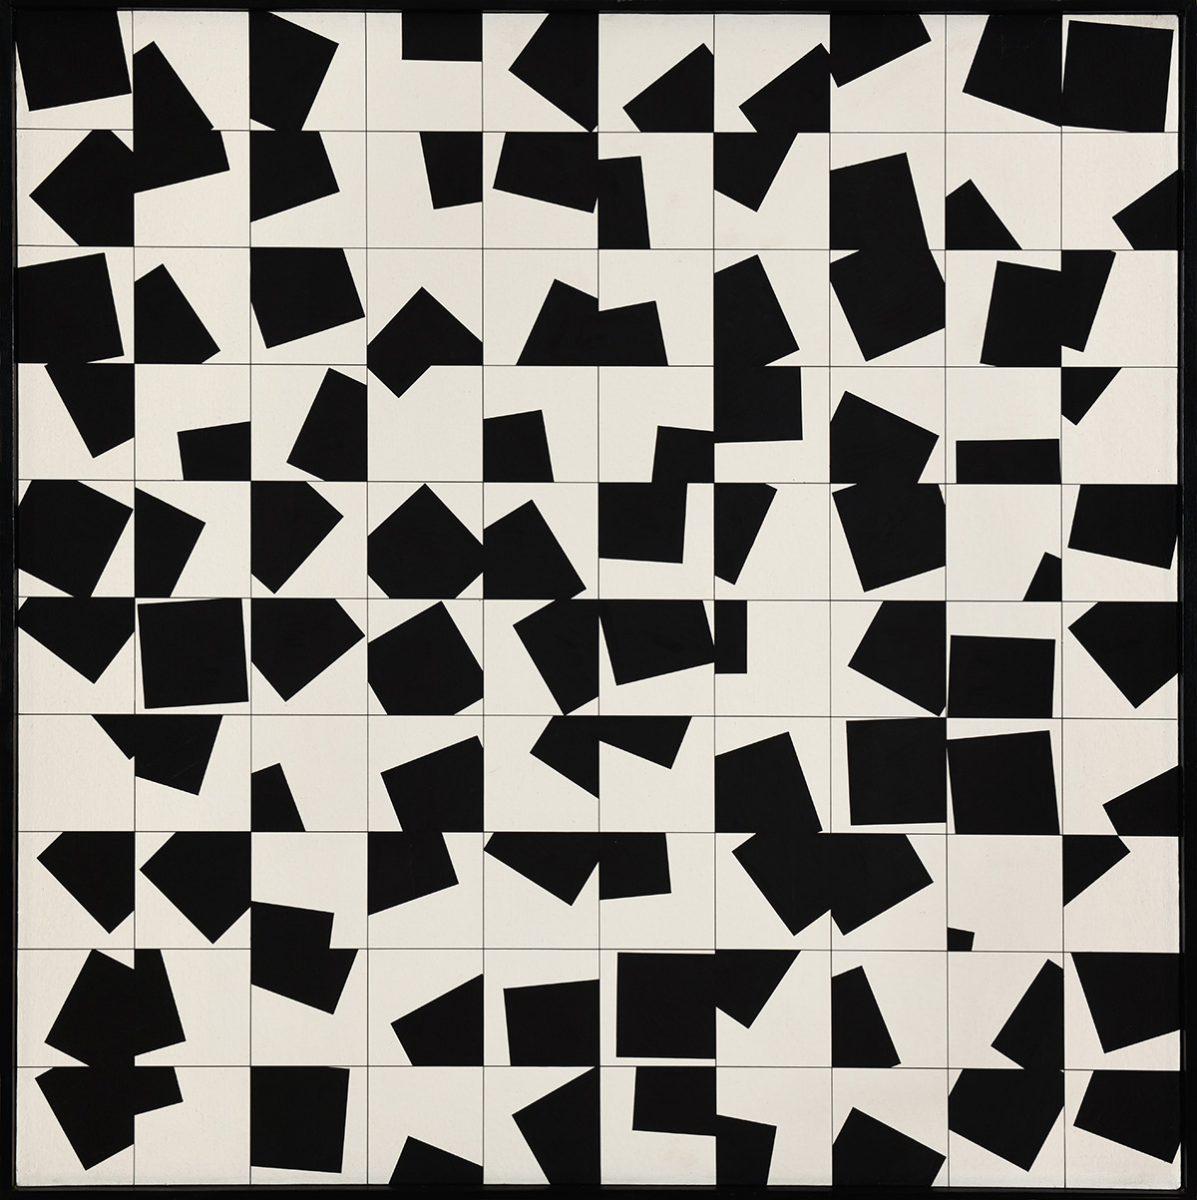 Ryszard Winiarski, sztuka polska, sztuka współczesna, niezła sztuka